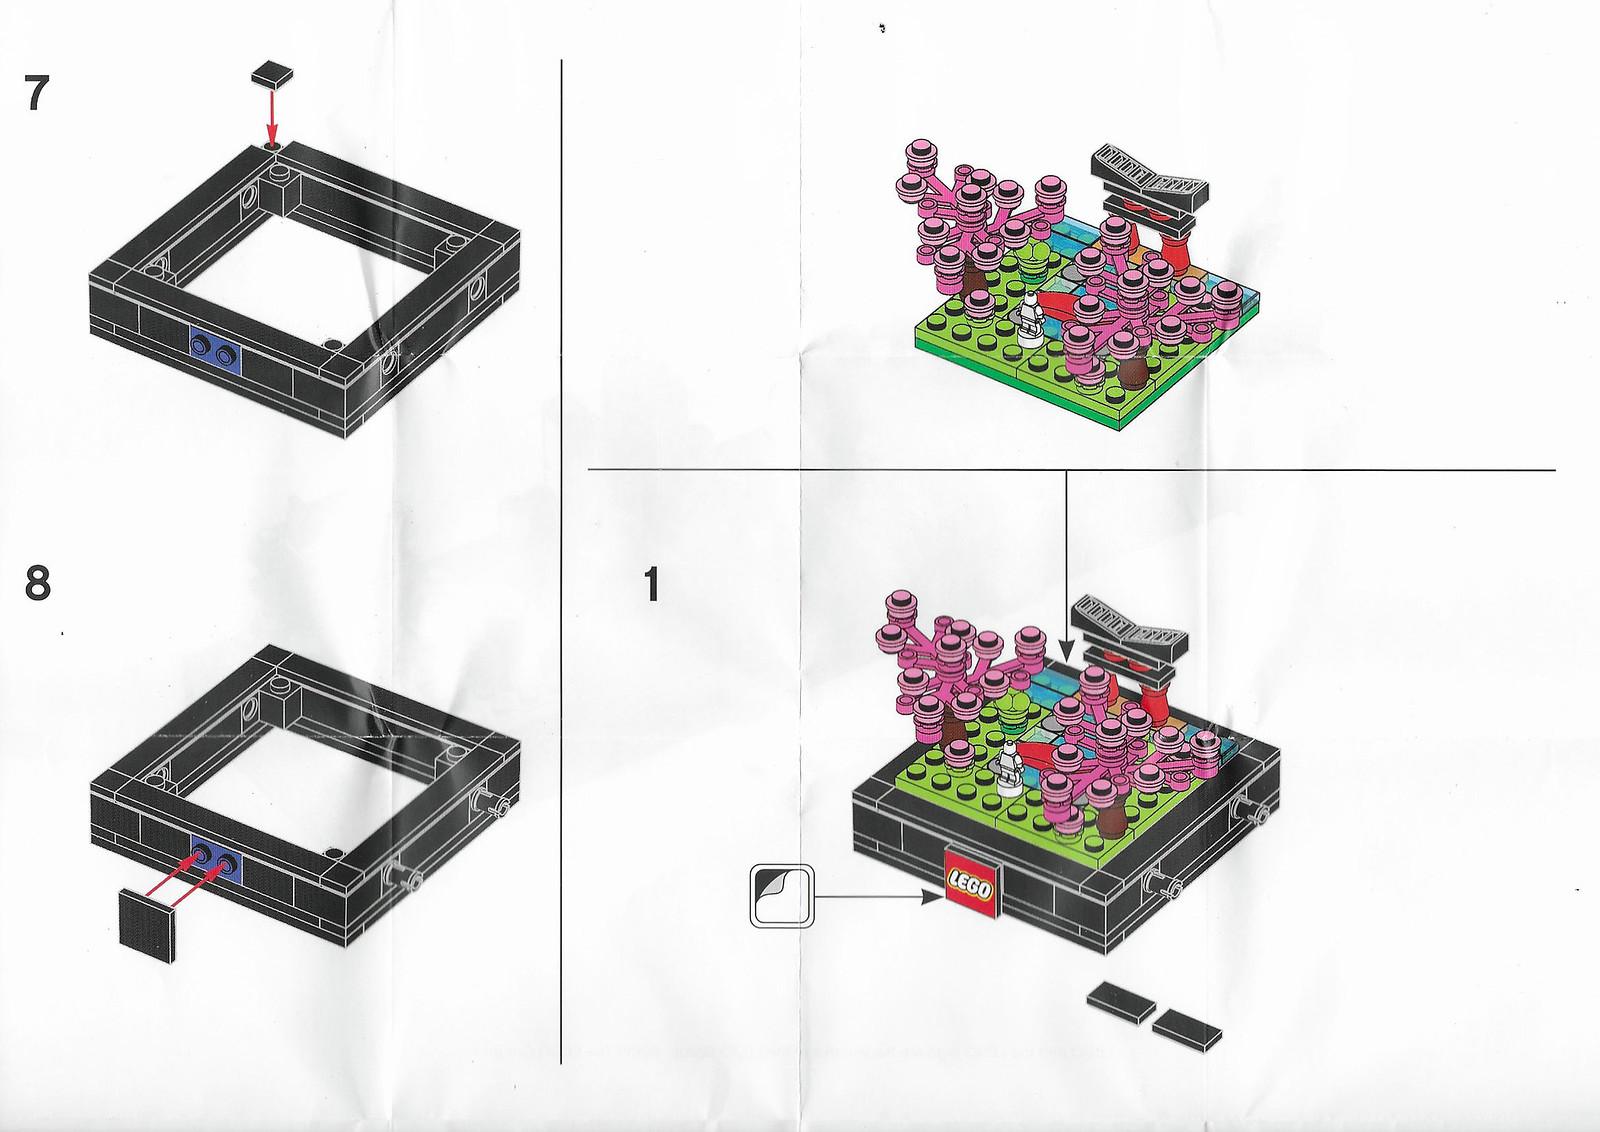 Toys 'R' Us LEGO Bricktober 2019 - Base